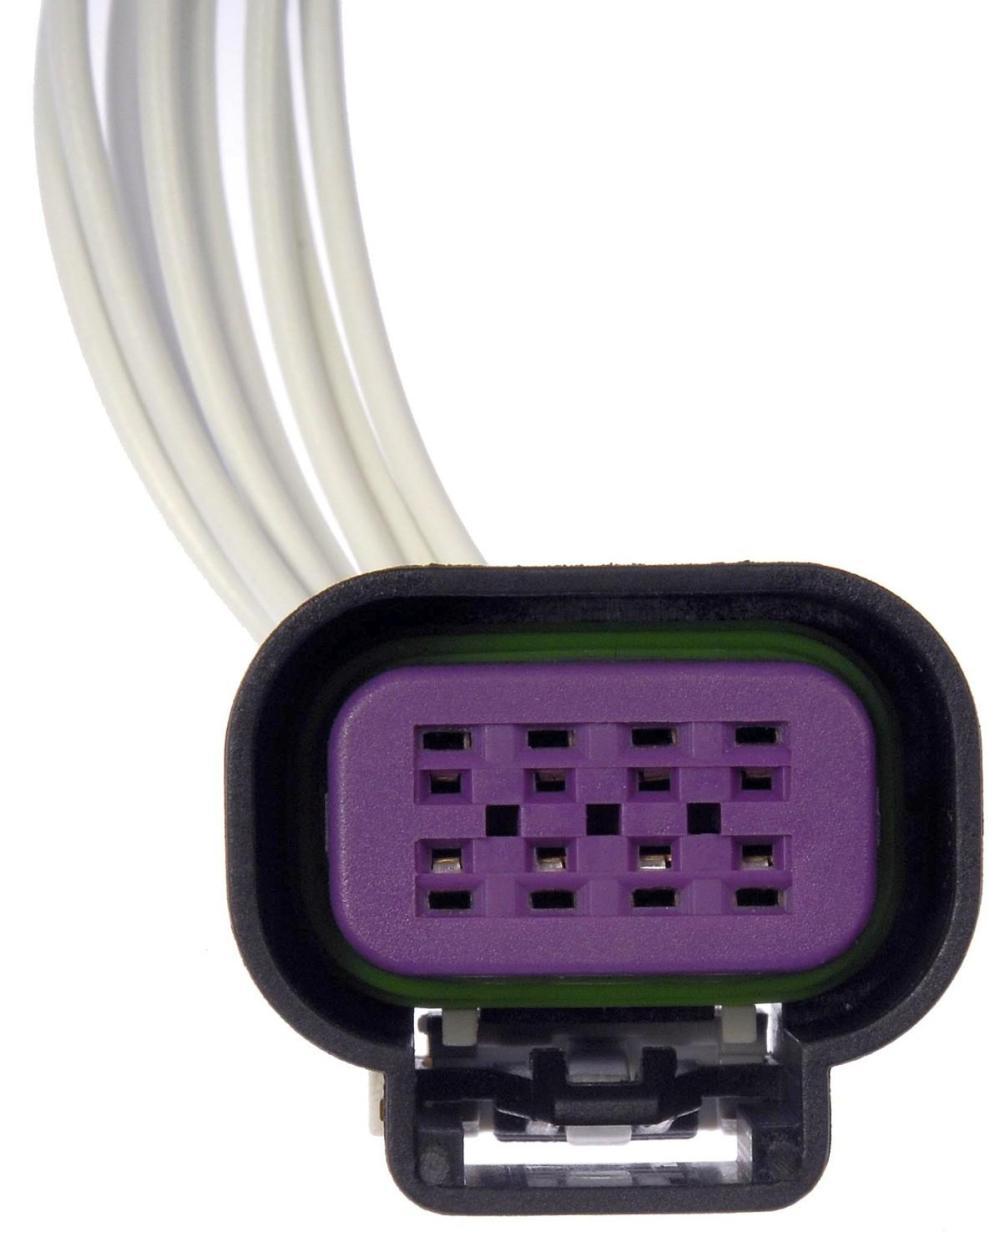 medium resolution of dorman techoice throttle position sensor connector dtc 645 800